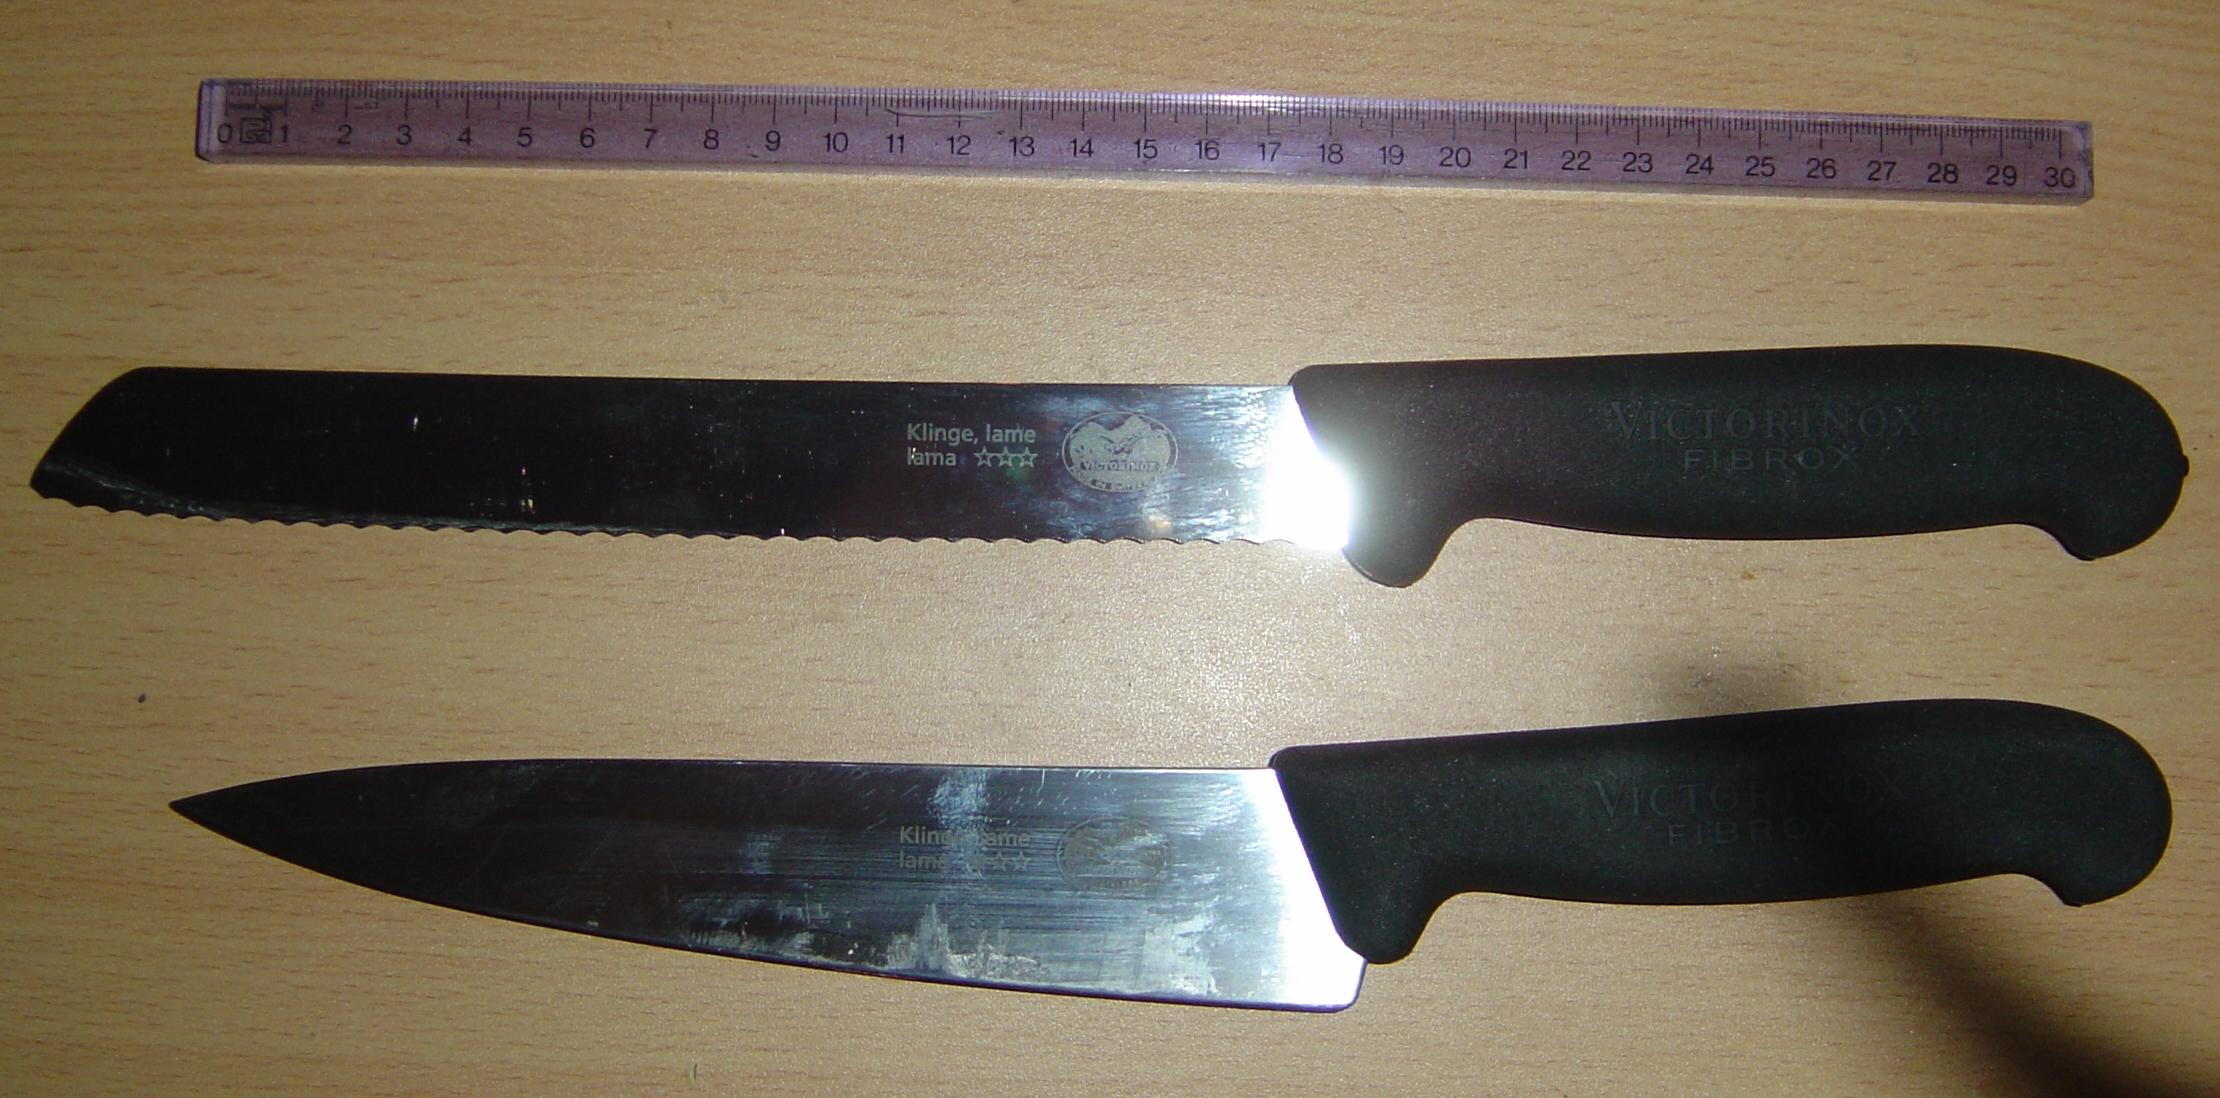 knives kitchen knife sheaths dlumo plastic leather sheath set sale victorinox kitchen knives sale picture ideas kitchen design